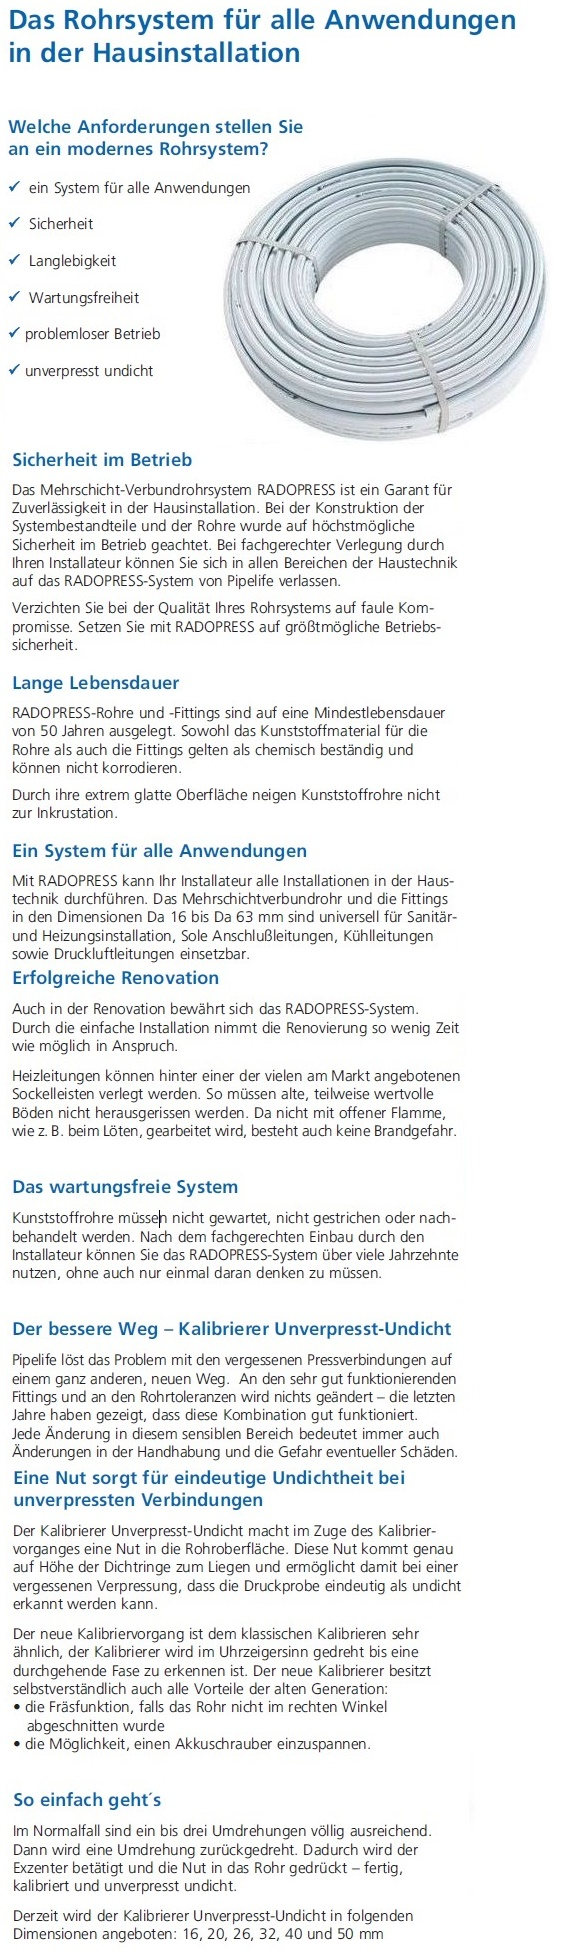 50m ALU Verbundrohr 26 x 3 mm PE-X PipeLife DVGW Grundpreis 2,40€//m PEX